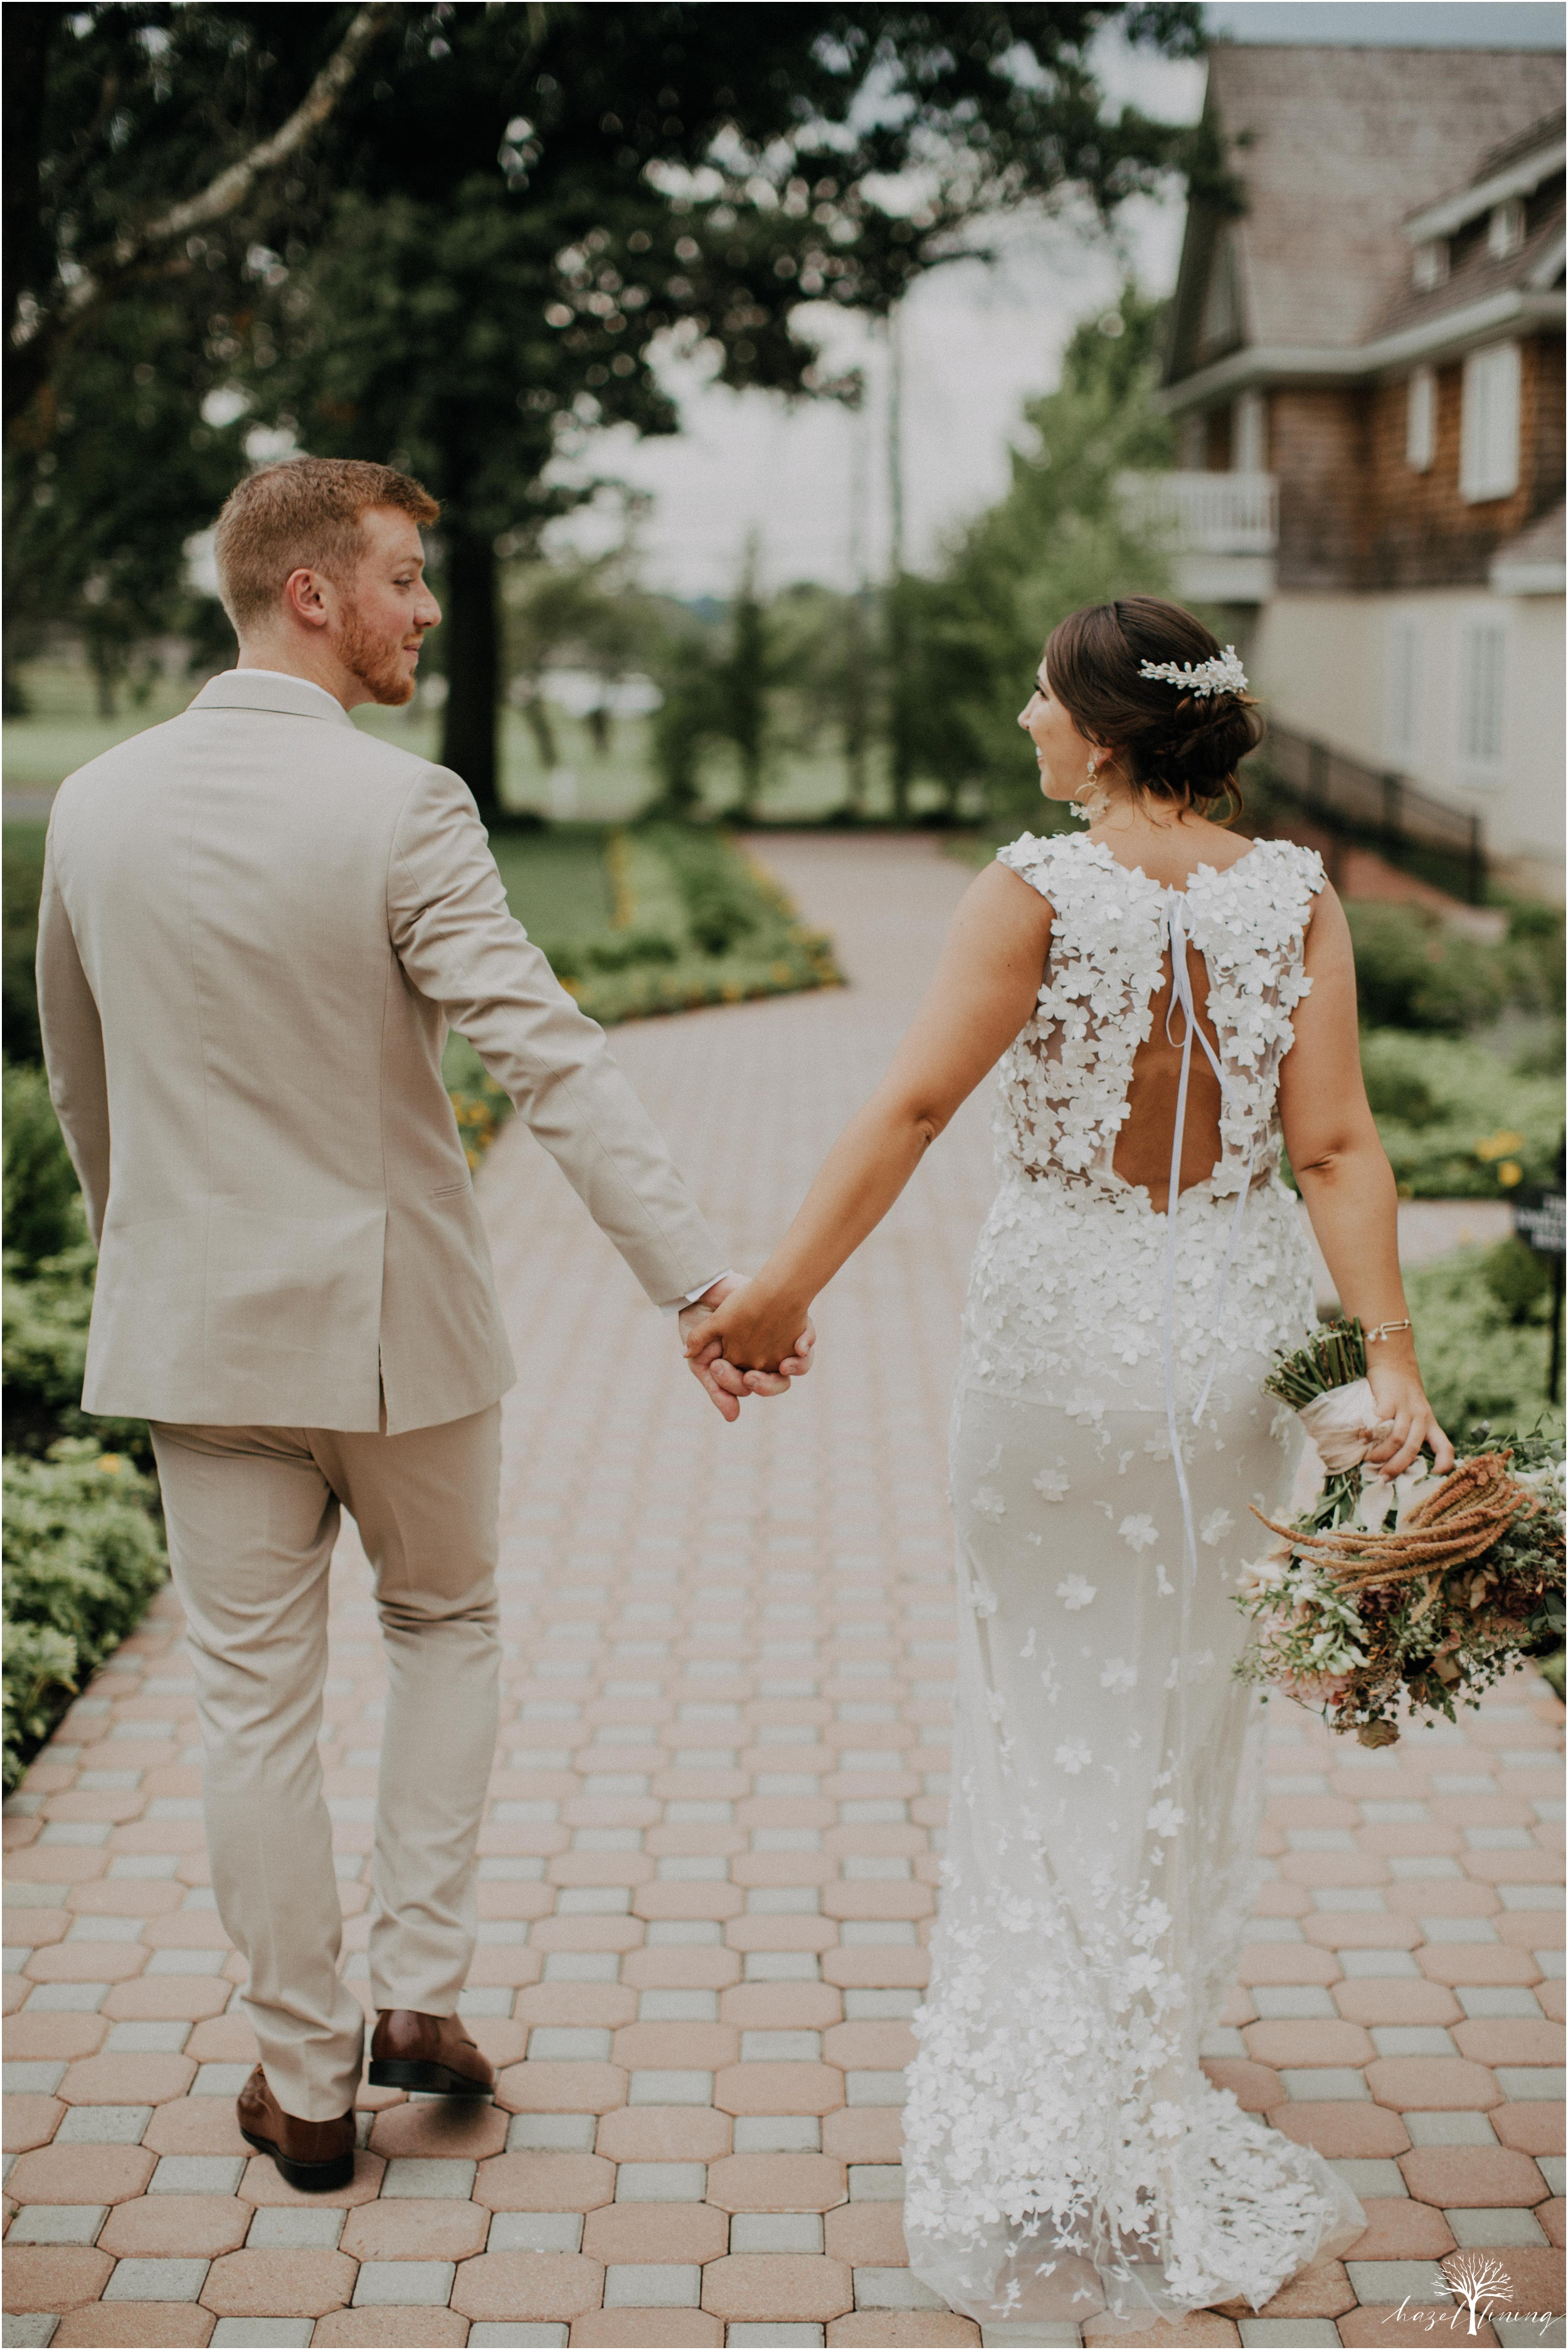 carl-chloe-the-ryland-inn-whitehouse-station-new-jersey-styled-squad-hazel-lining-photography-destination-elopement-wedding-engagement-photography_0026.jpg